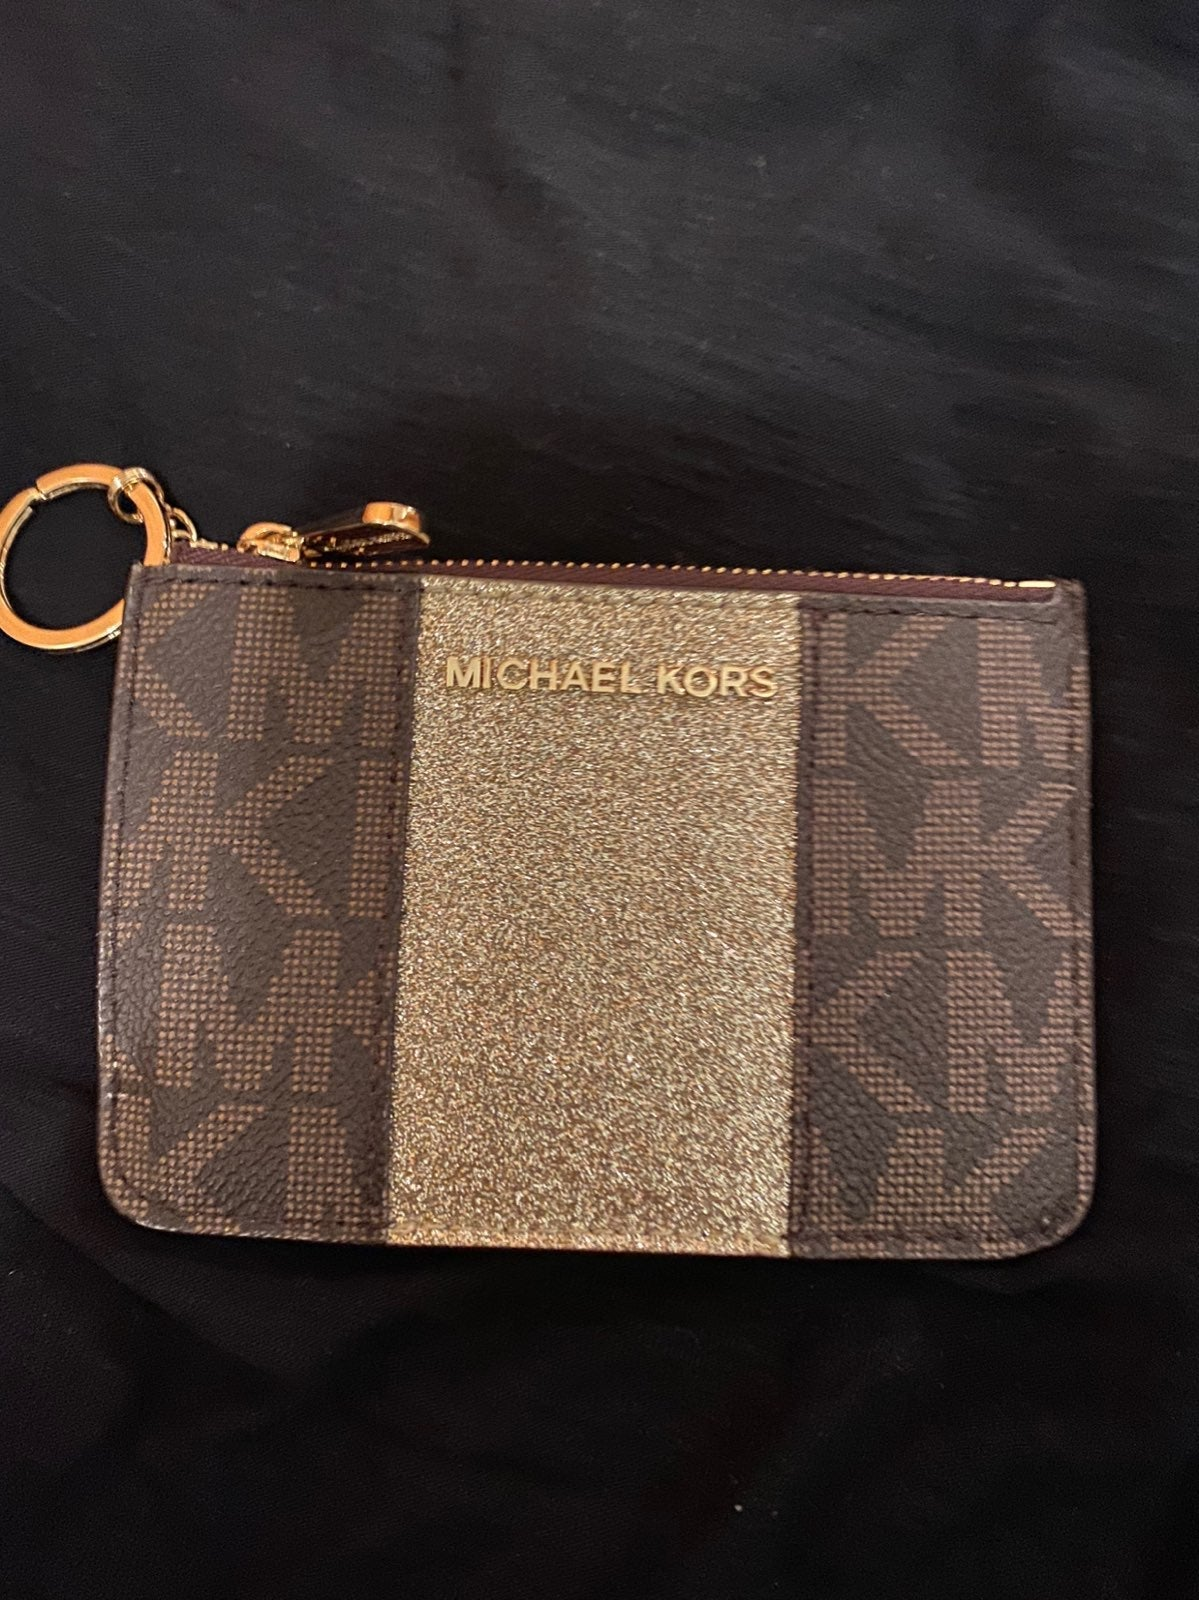 michael kors wallet keychain